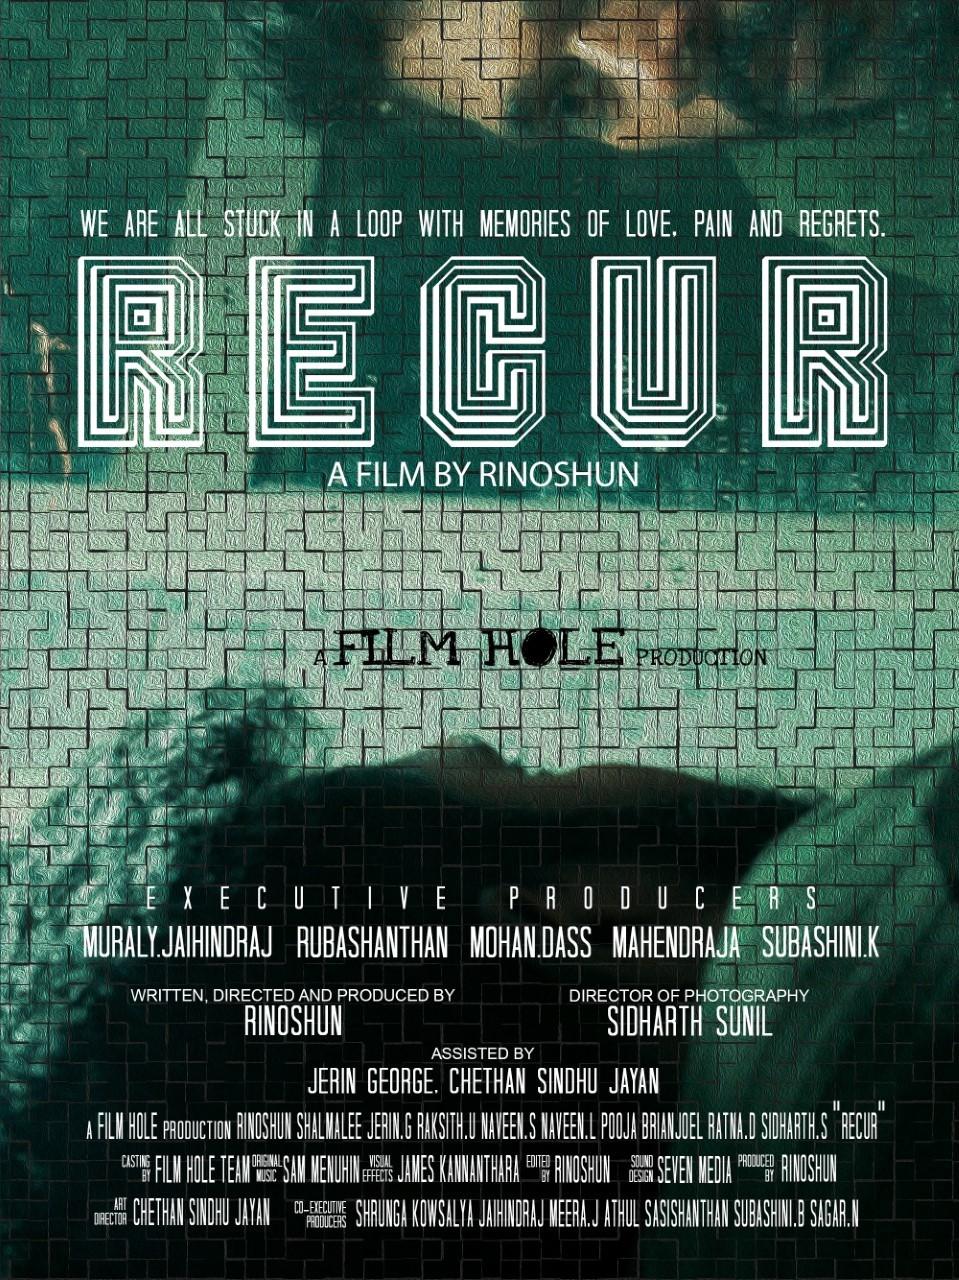 Poster for Recur showing protagonist.